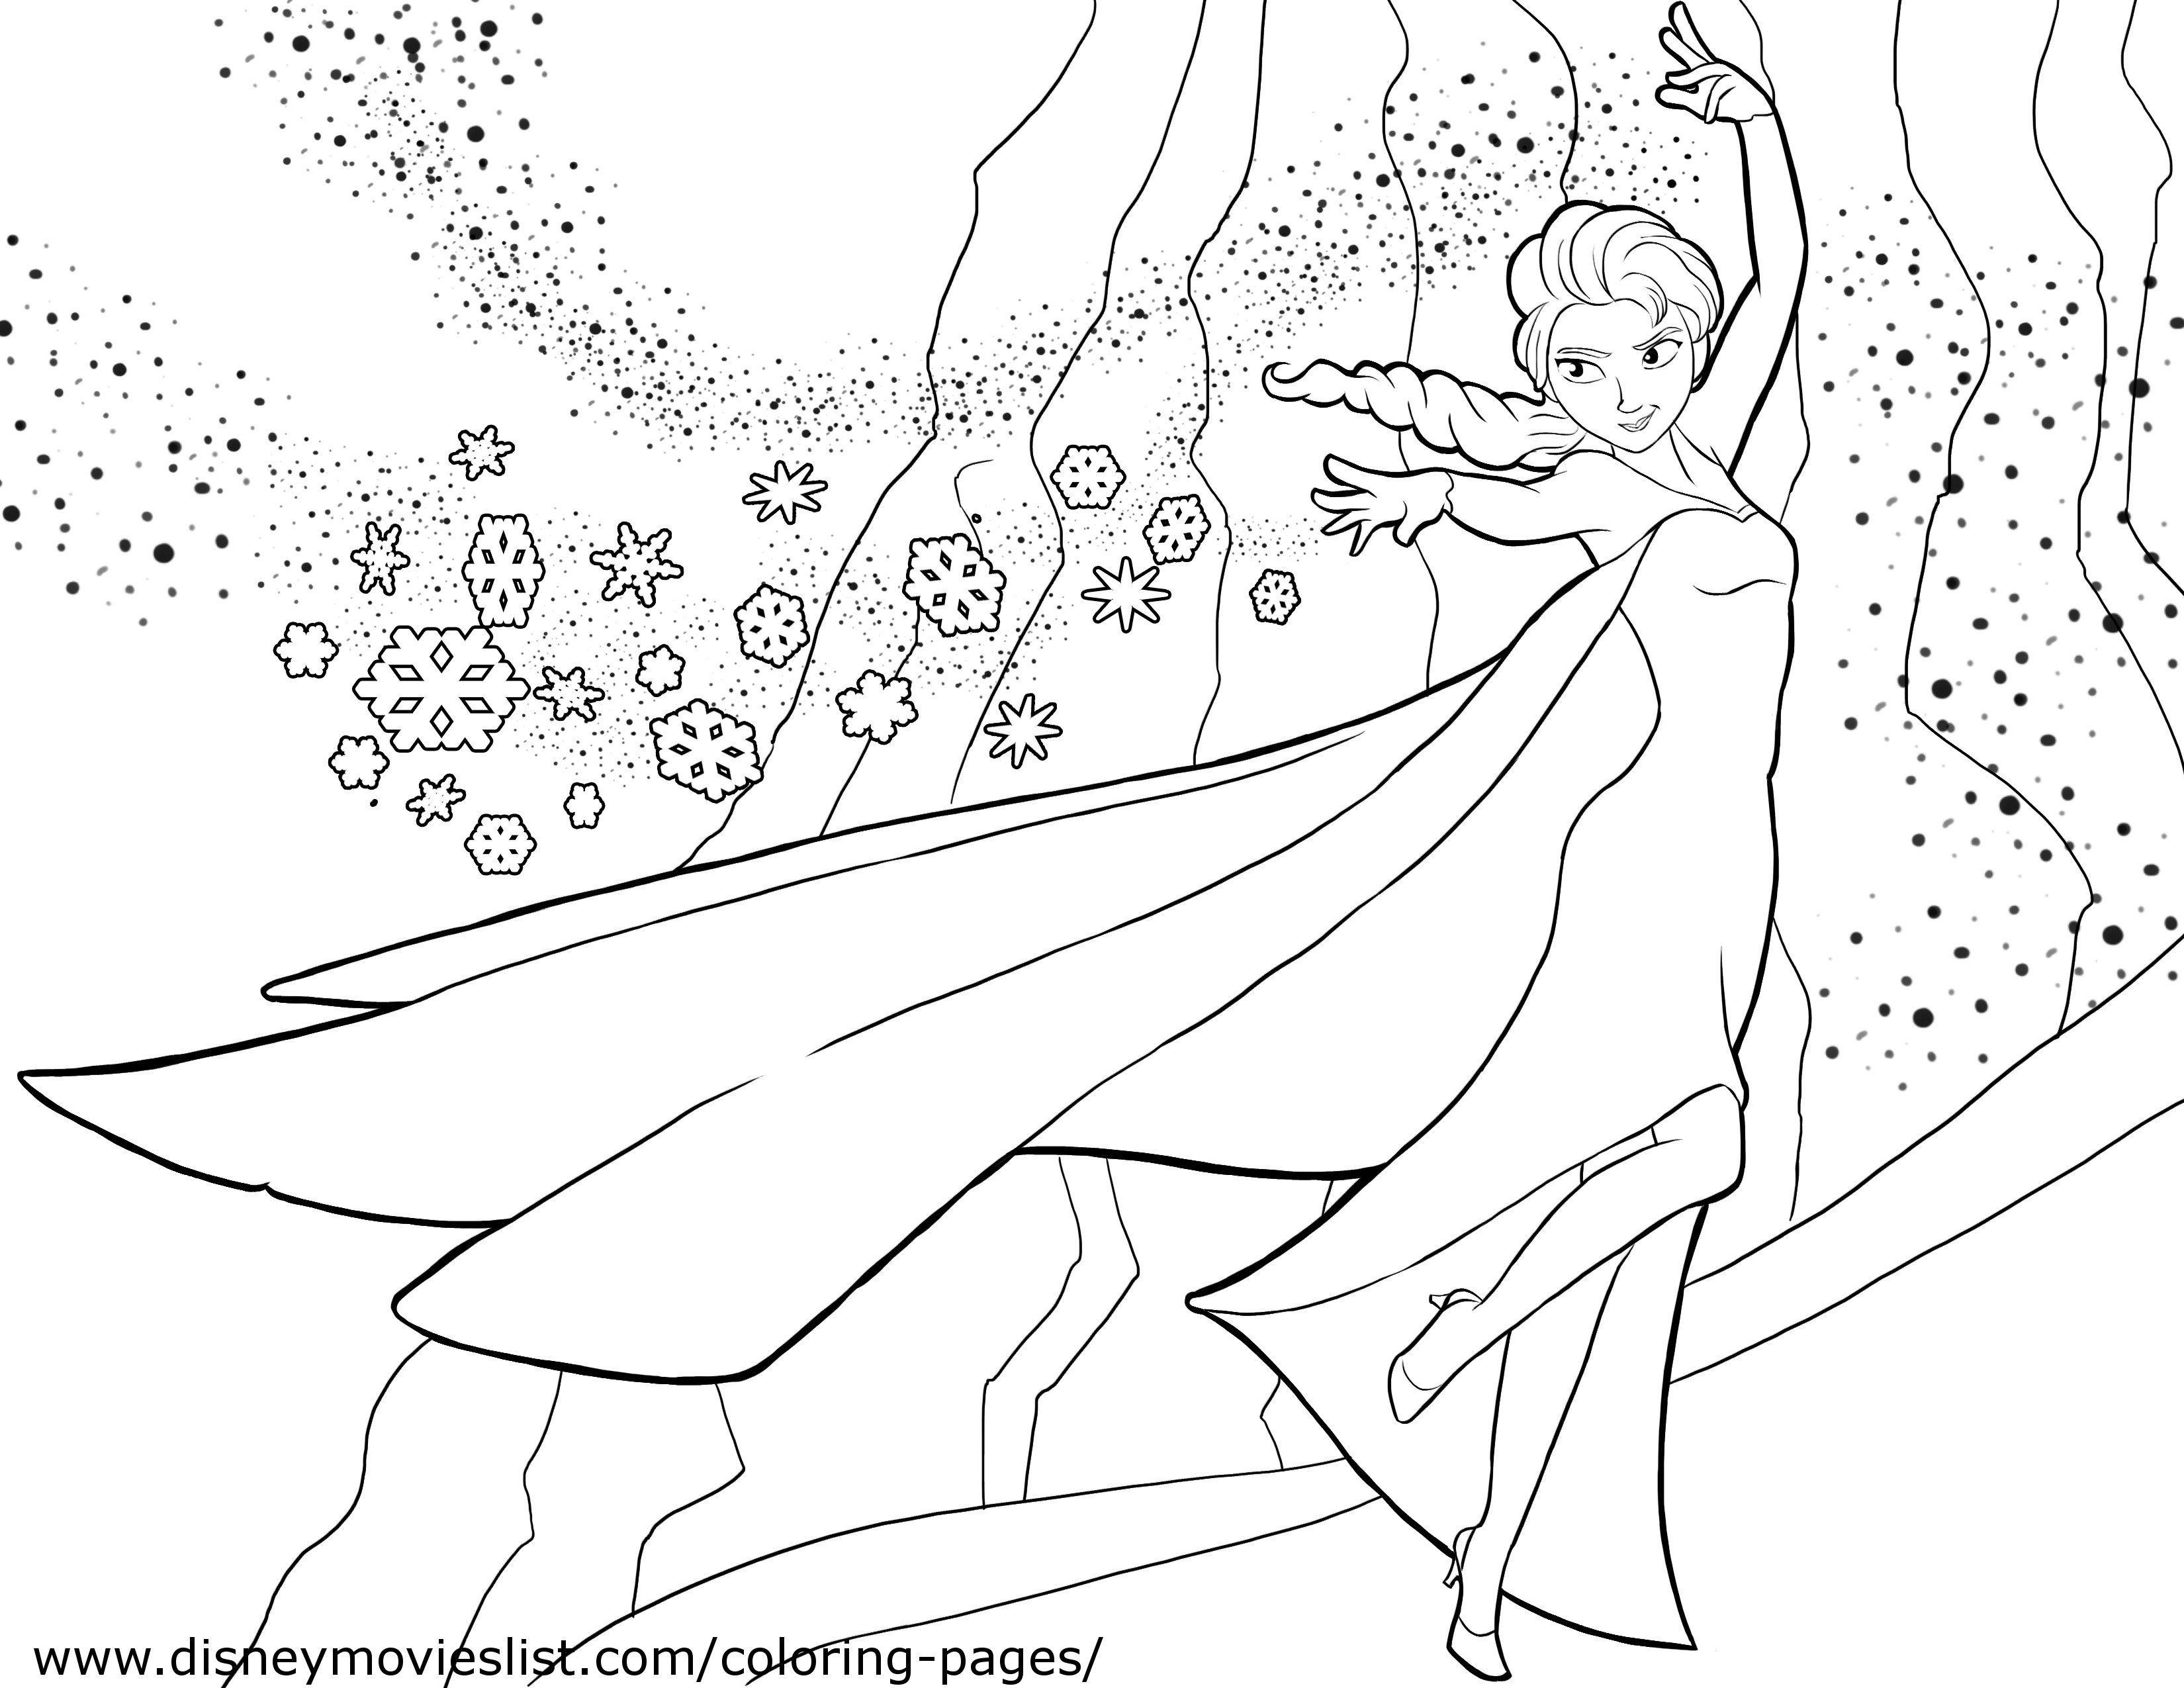 printable coloring pages frozen elsa downloads frozen coloring pages elsa face printable pages elsa frozen coloring